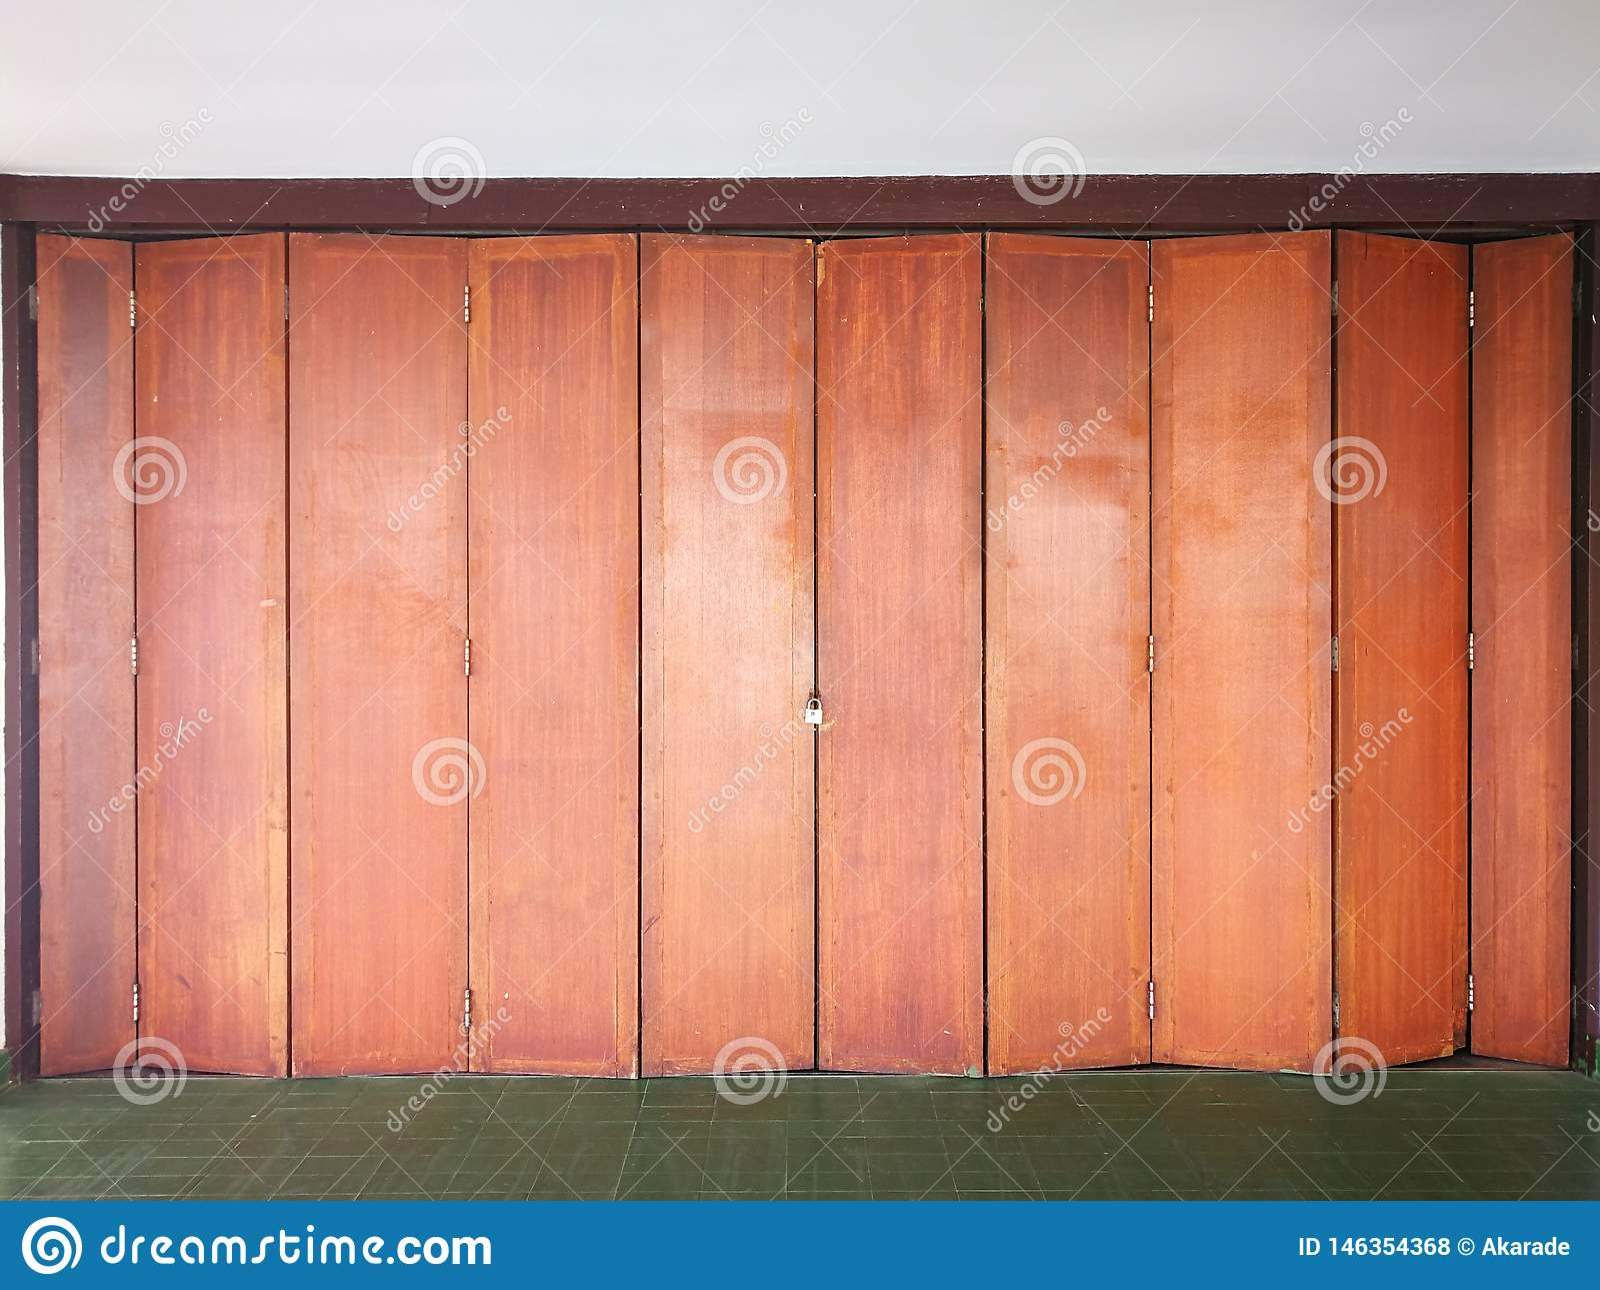 Wooden doors in the closed work